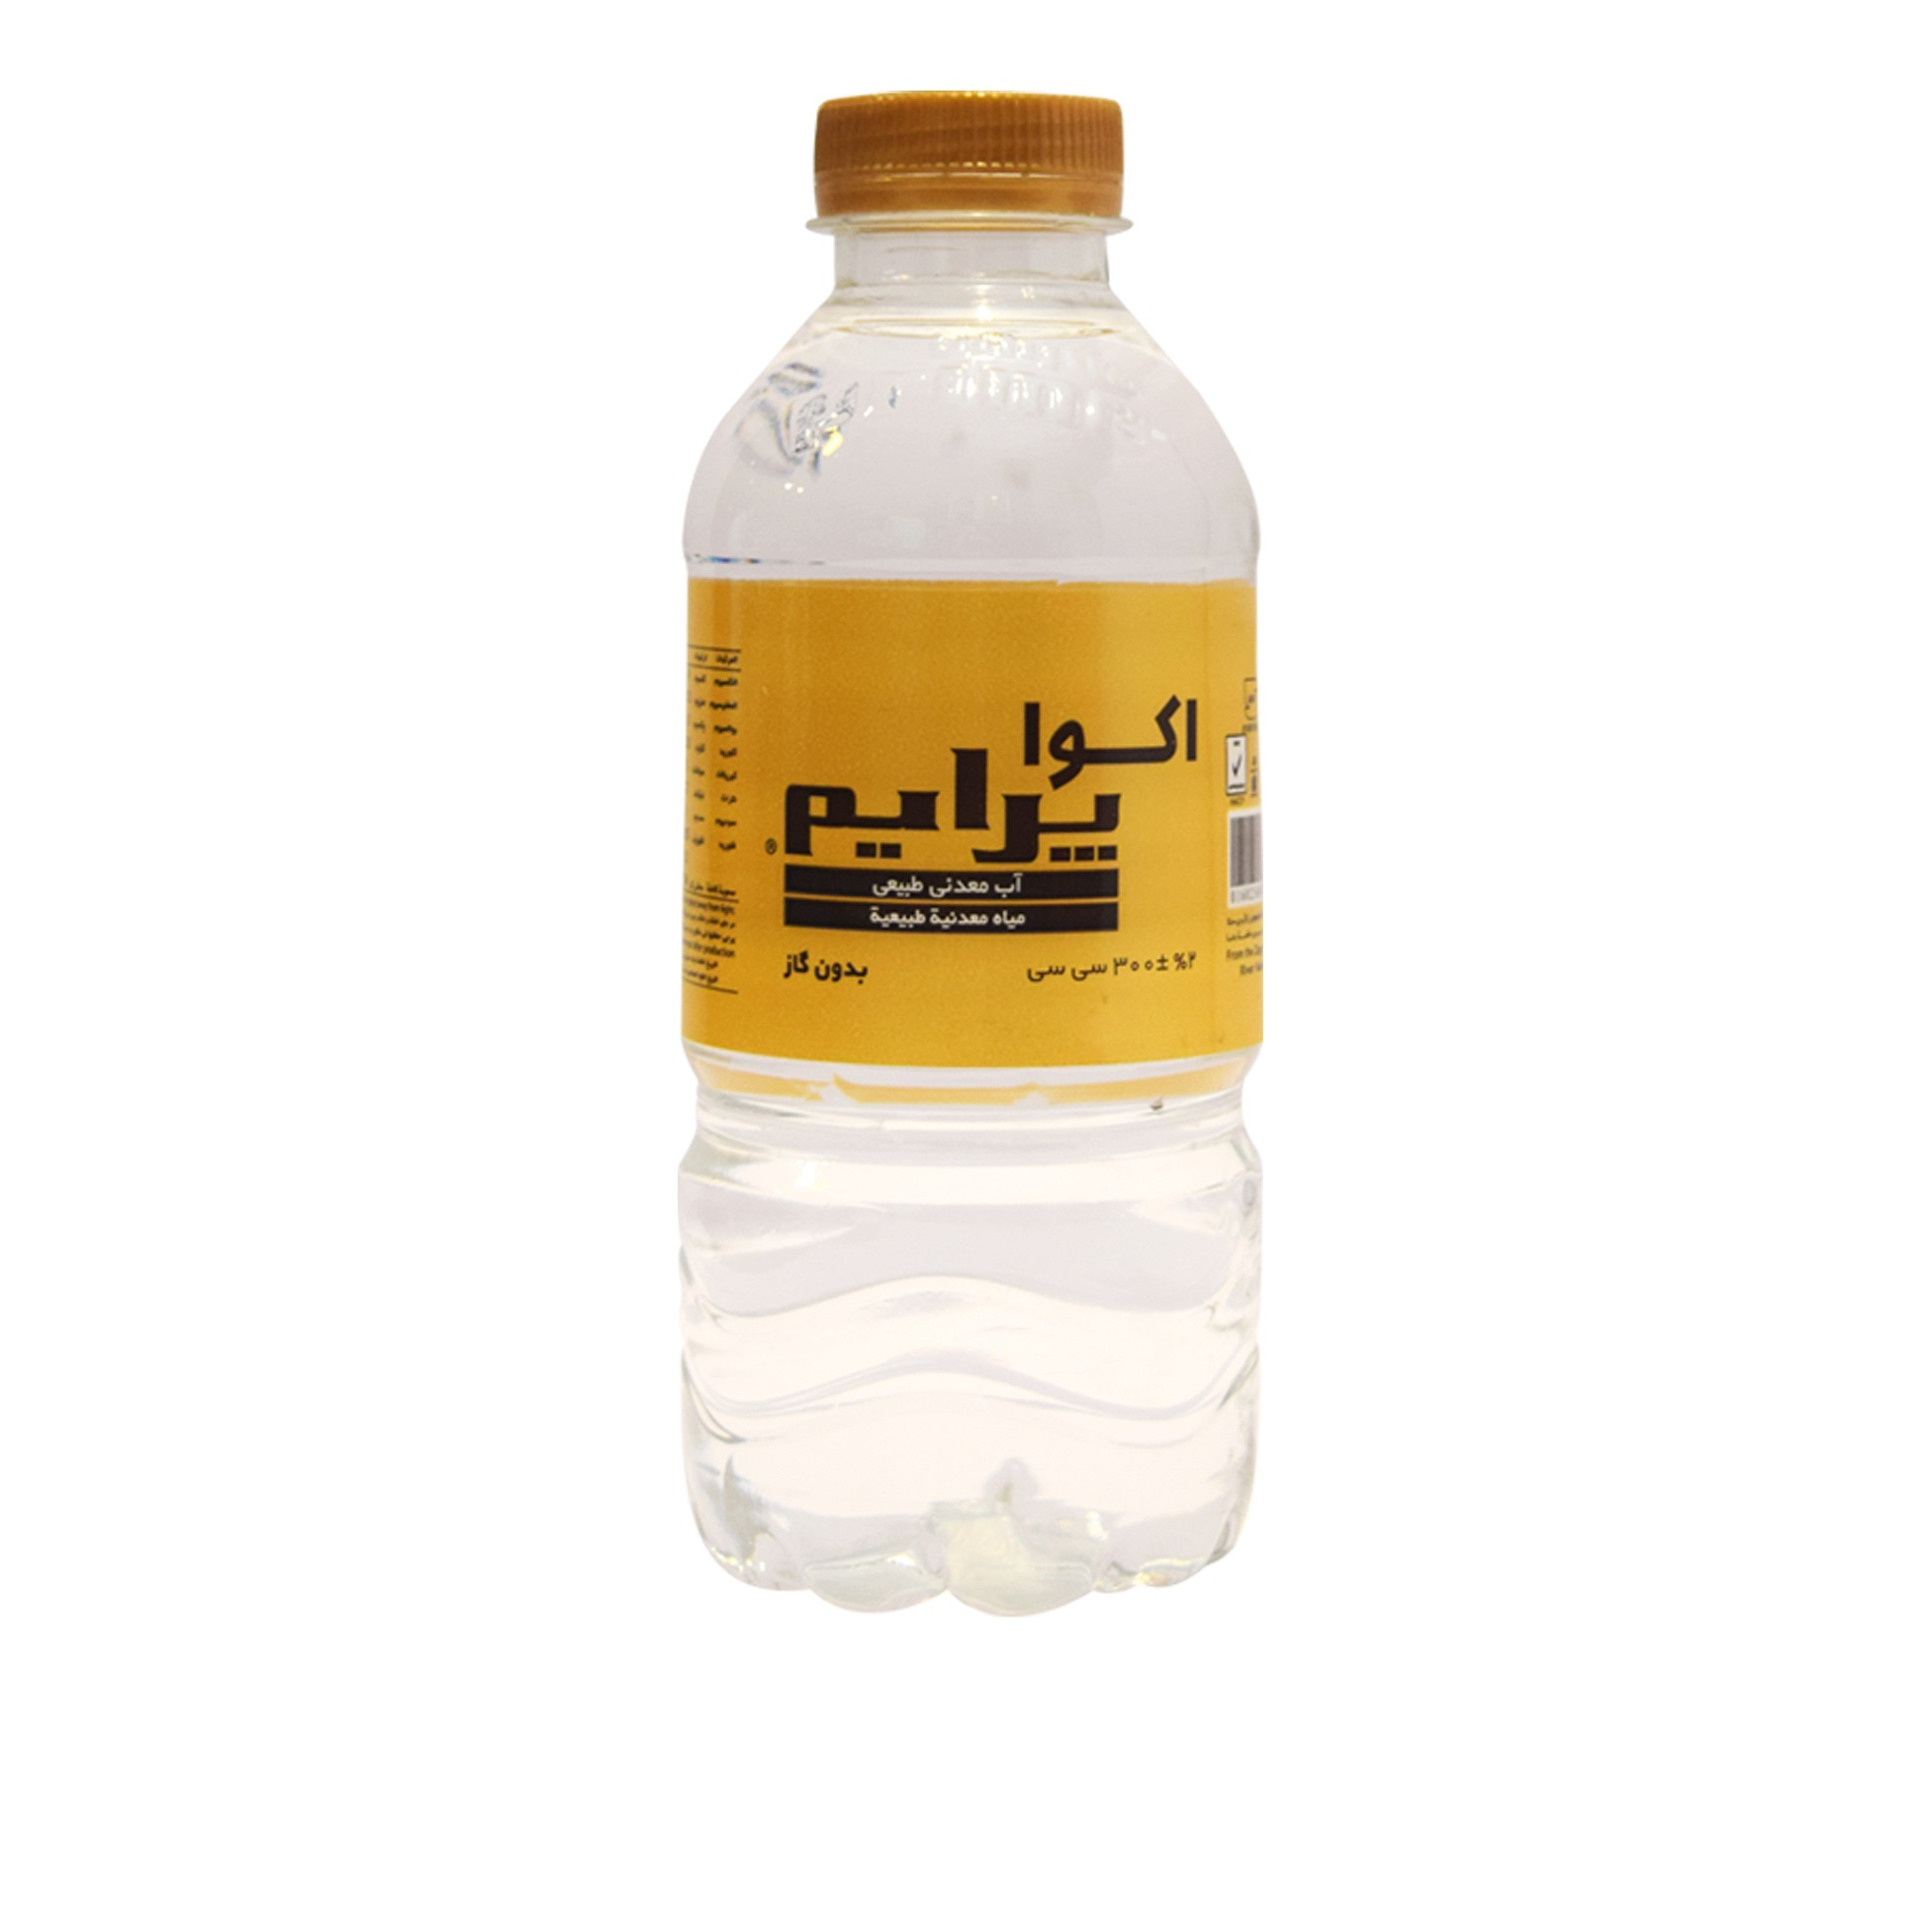 آب معدنی آکوا پرایم -300 میلی لیتر بسته 12 عددی